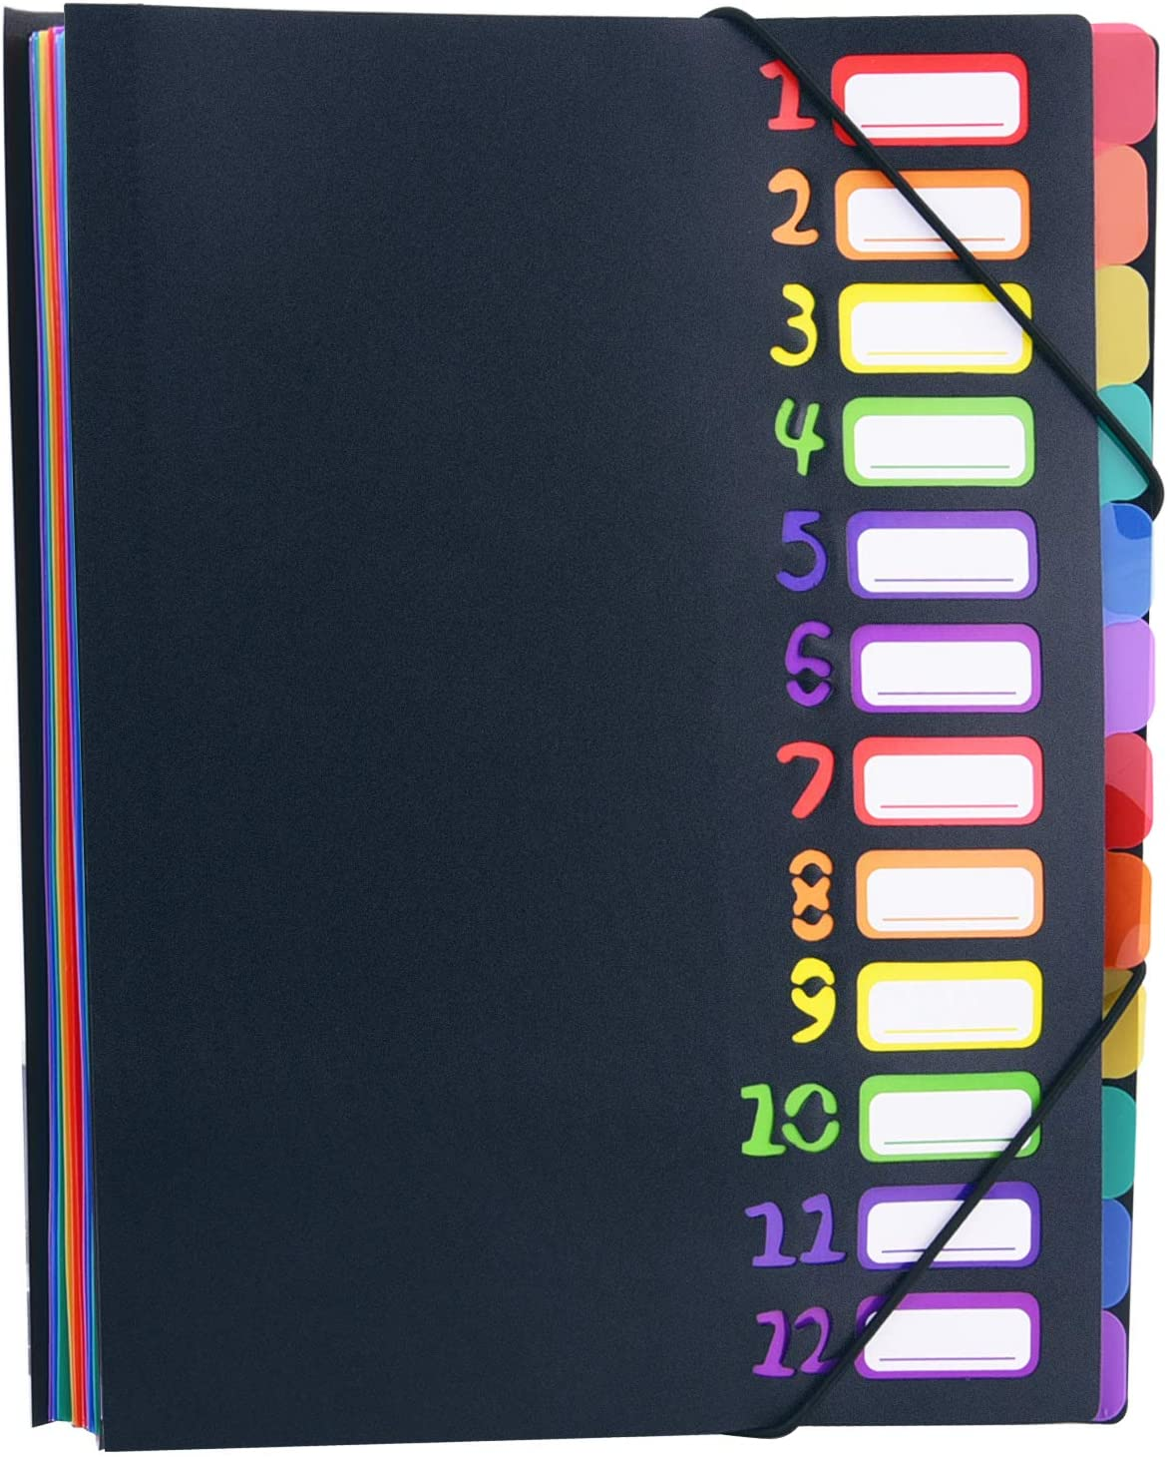 Livder Expanding File Folders, 12 Pocket Letter A4 Paper Project Sorter Plastic Document Organizer